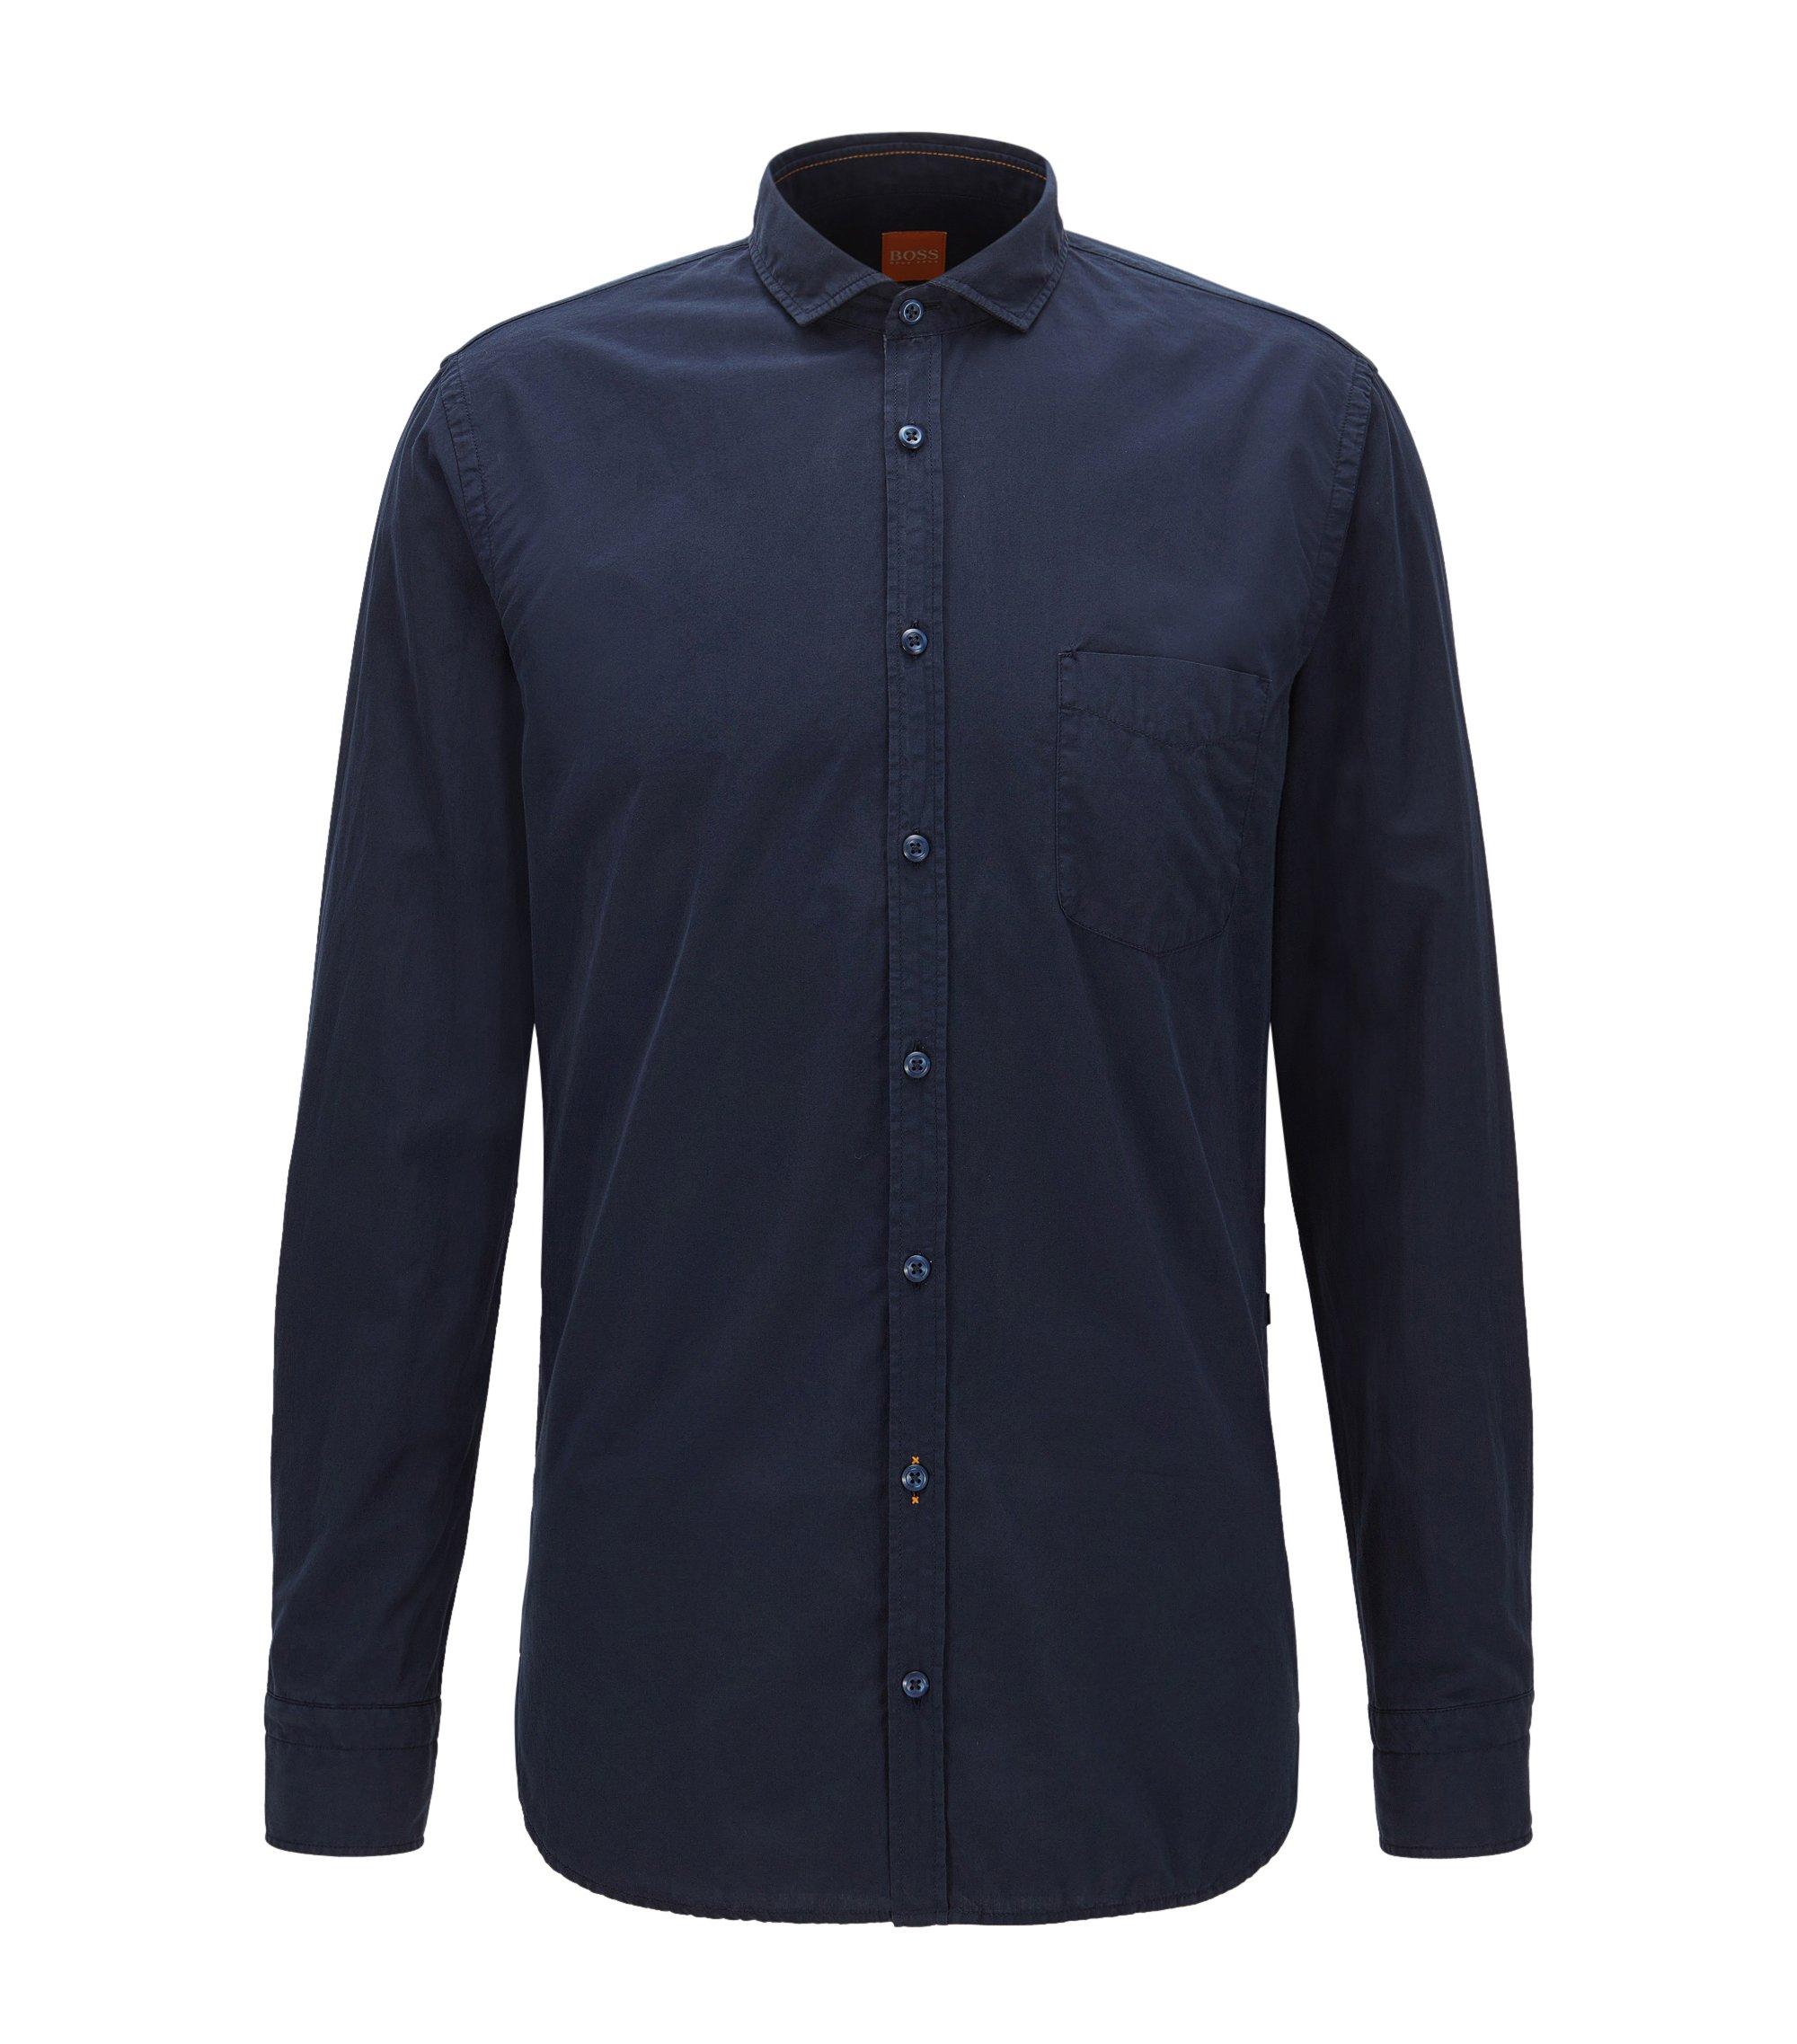 Camisa slim fit en popelín de algodón teñido en prenda, Azul oscuro